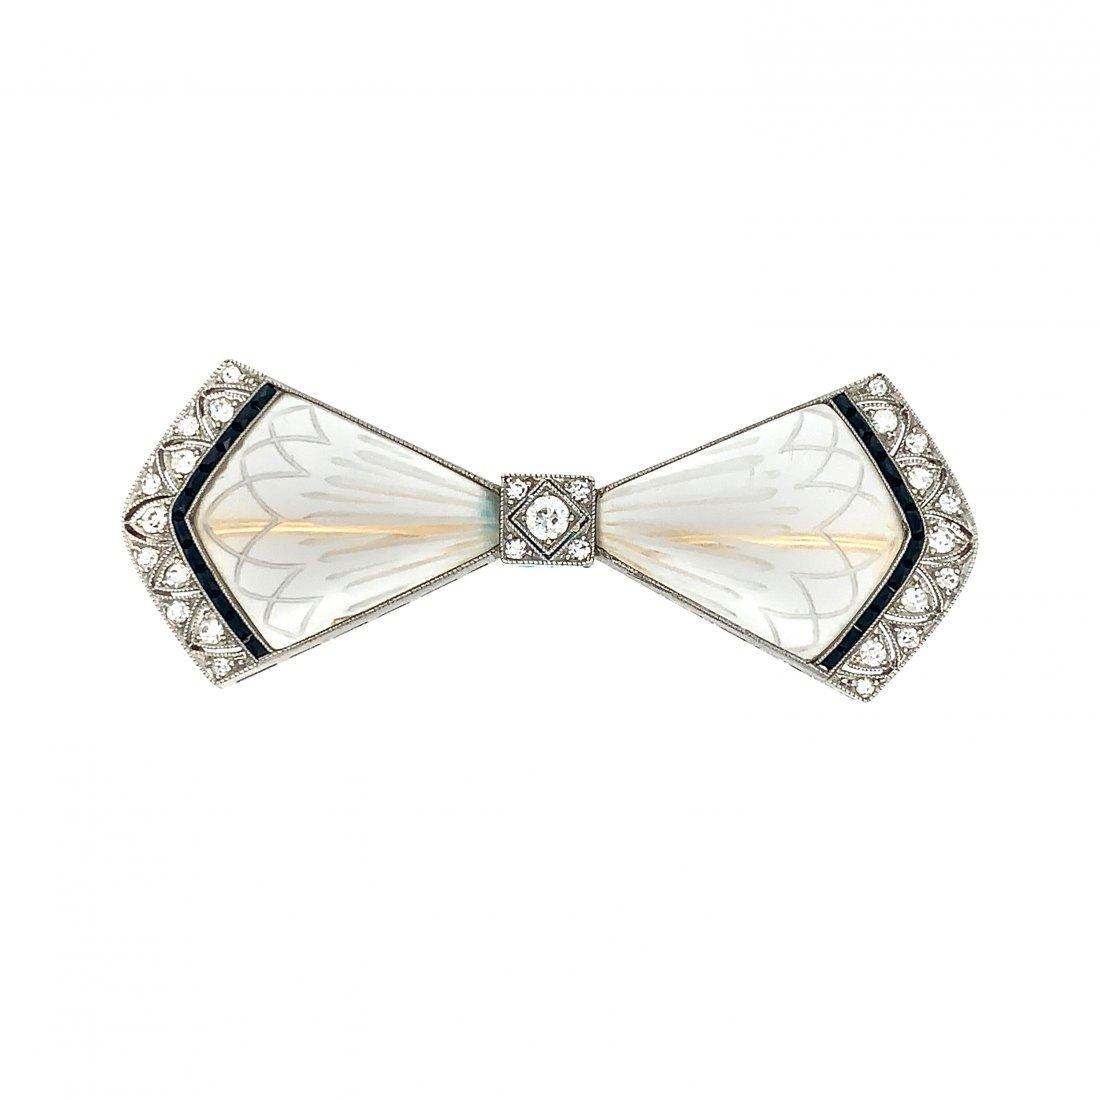 Art Deco Crystal Diamond Onyx Bow Pin Brooch